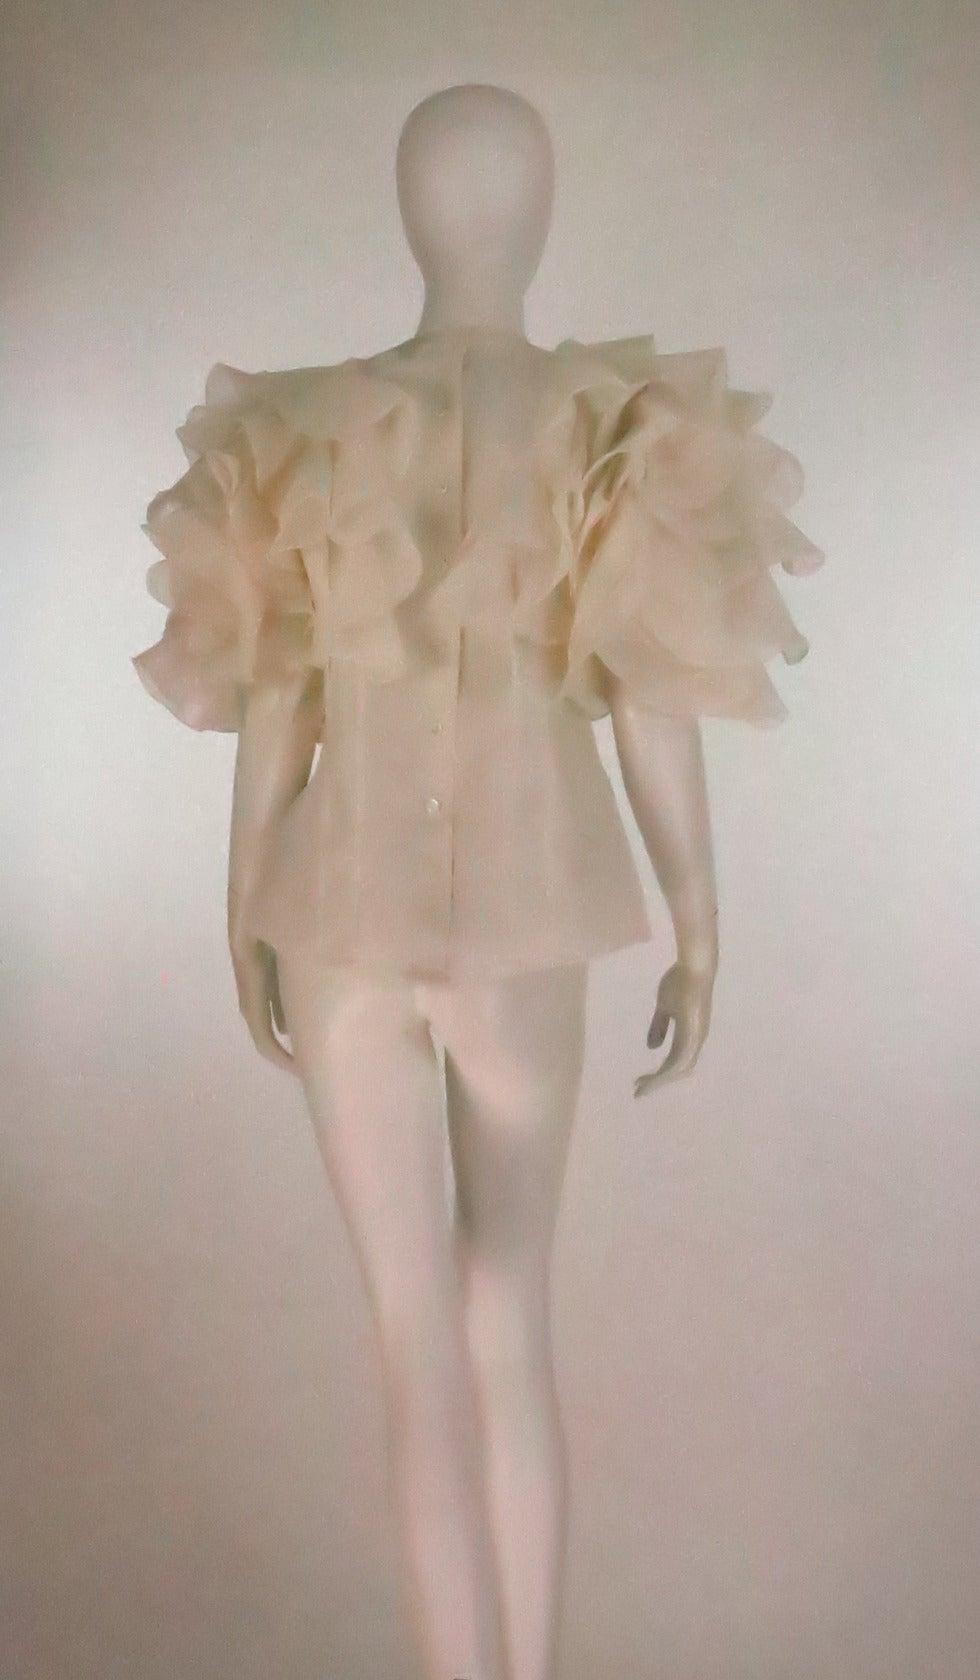 1990s Oscar de la Renta ivory organza ruffle sleeve blouse 5